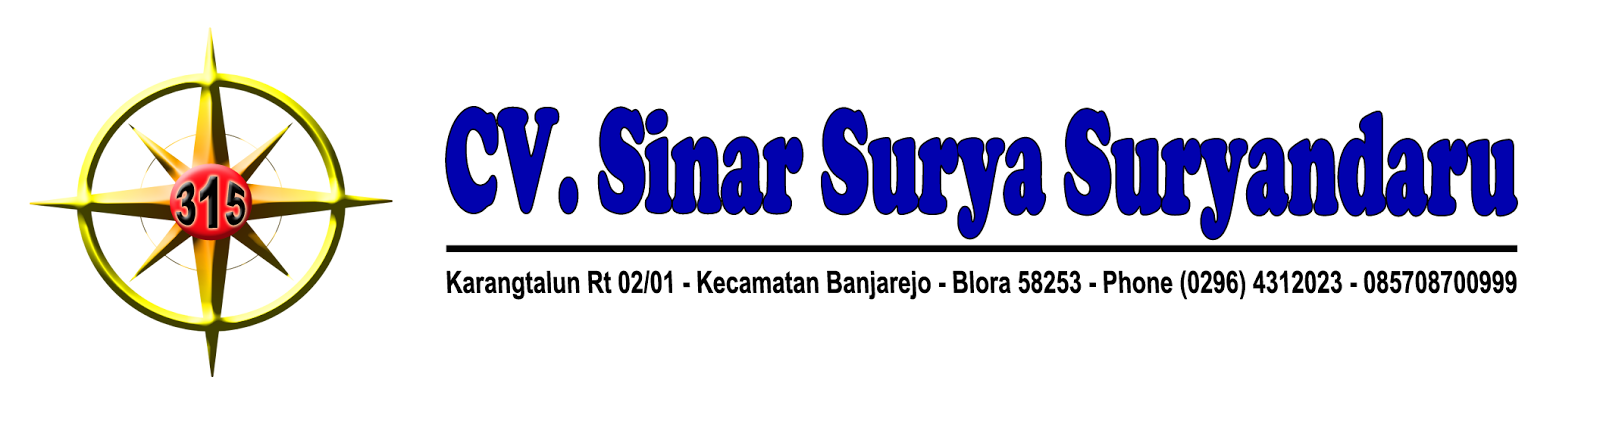 CV.SINAR SURYA SURYANDARU